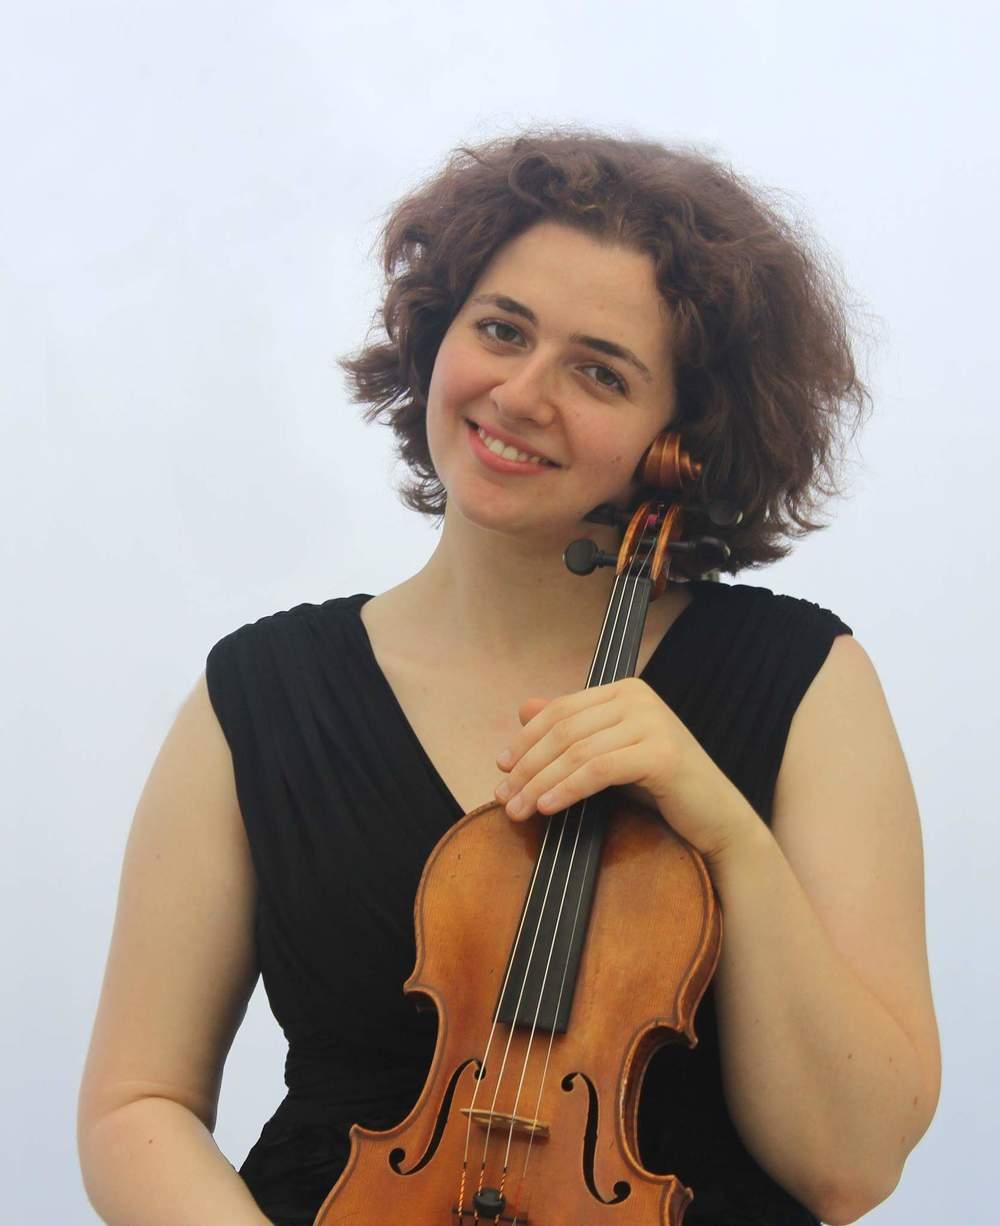 Hannah Tarley